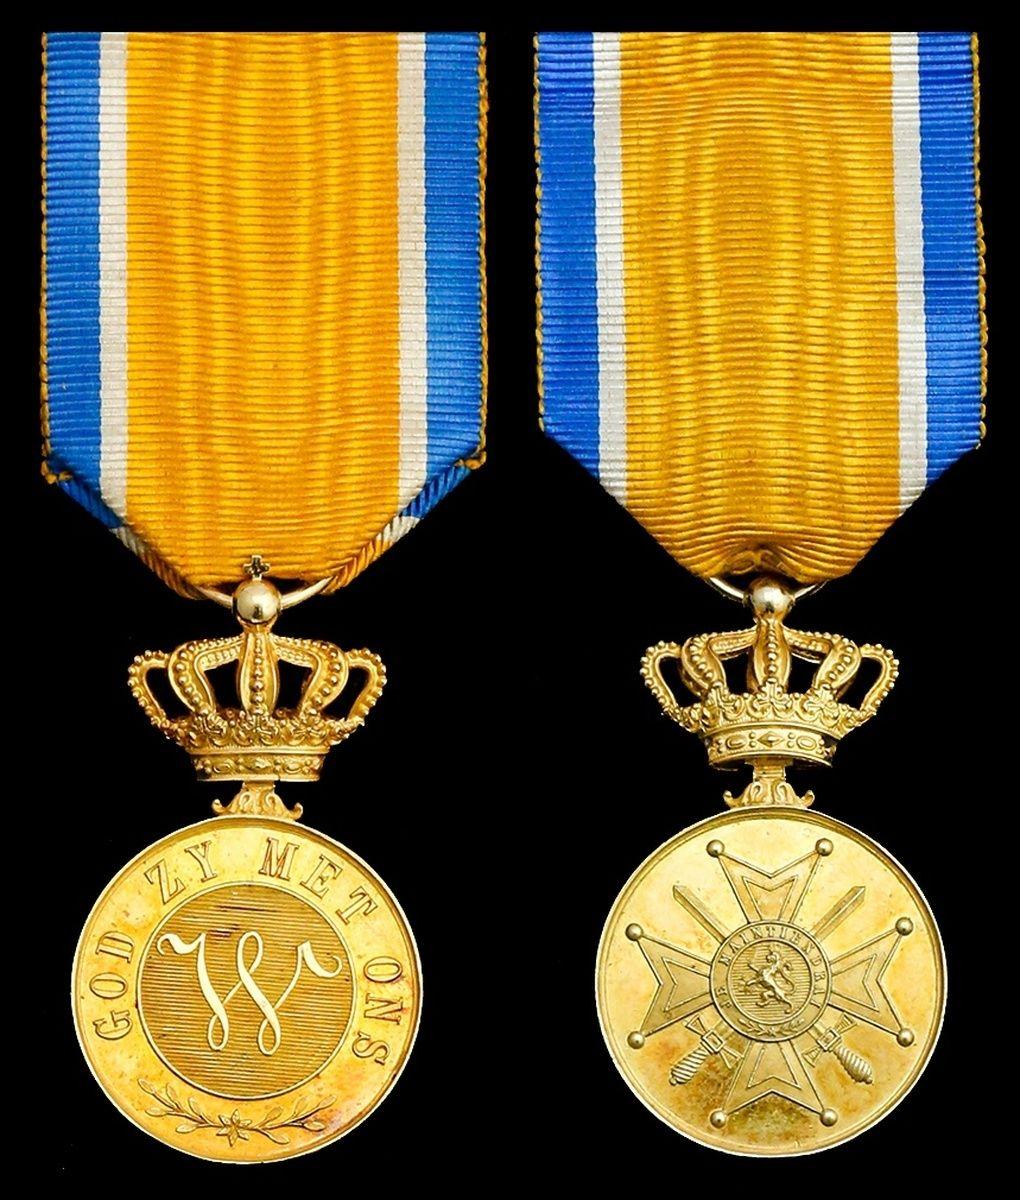 NETHERLANDS, Kingdom Order of Orange Nassau, Military